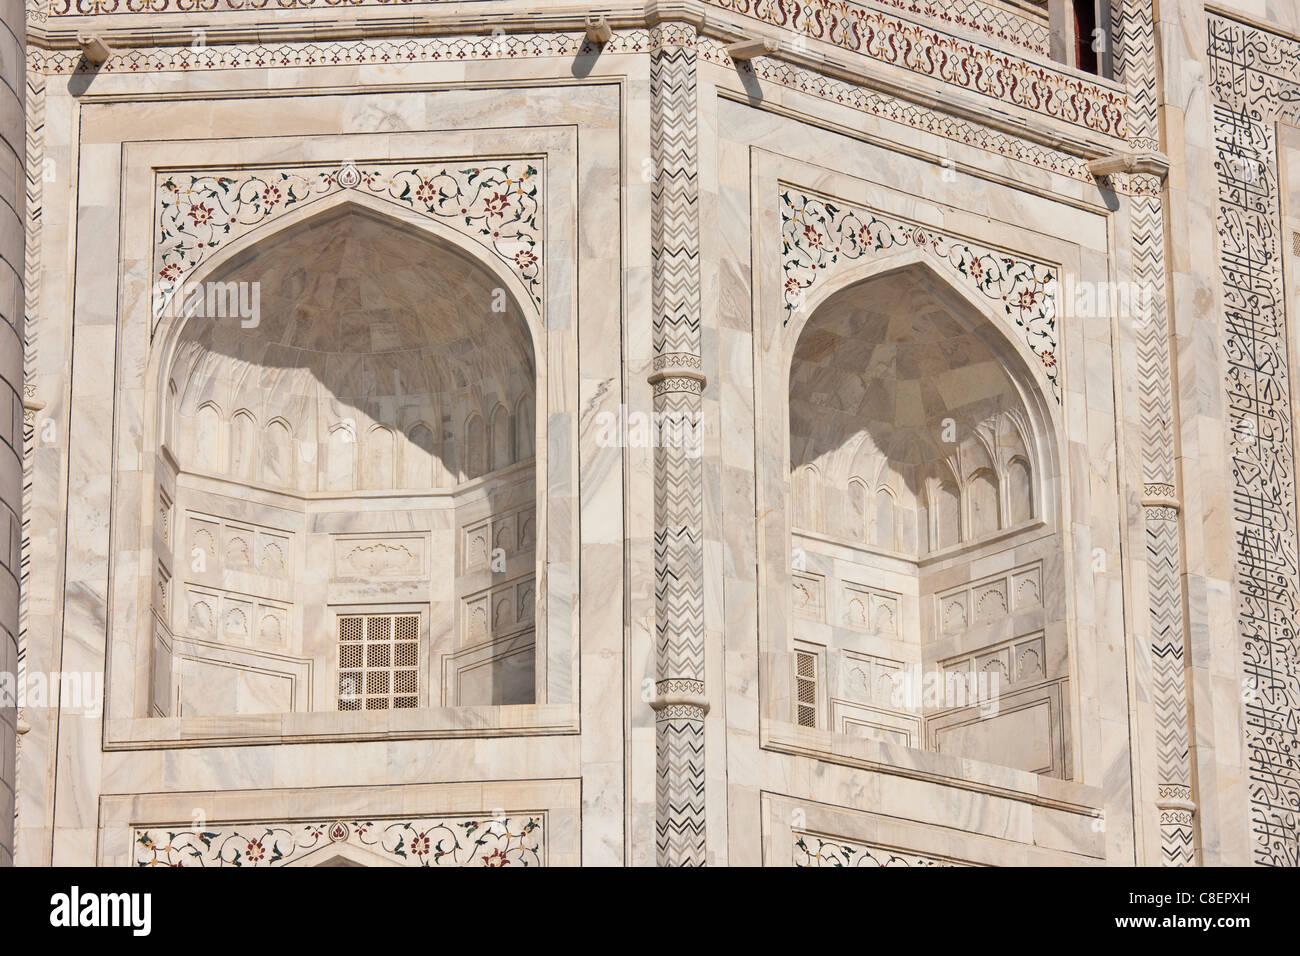 El mausoleo de Taj Mahal, el sur ver detalle, Uttar Pradesh, India Imagen De Stock